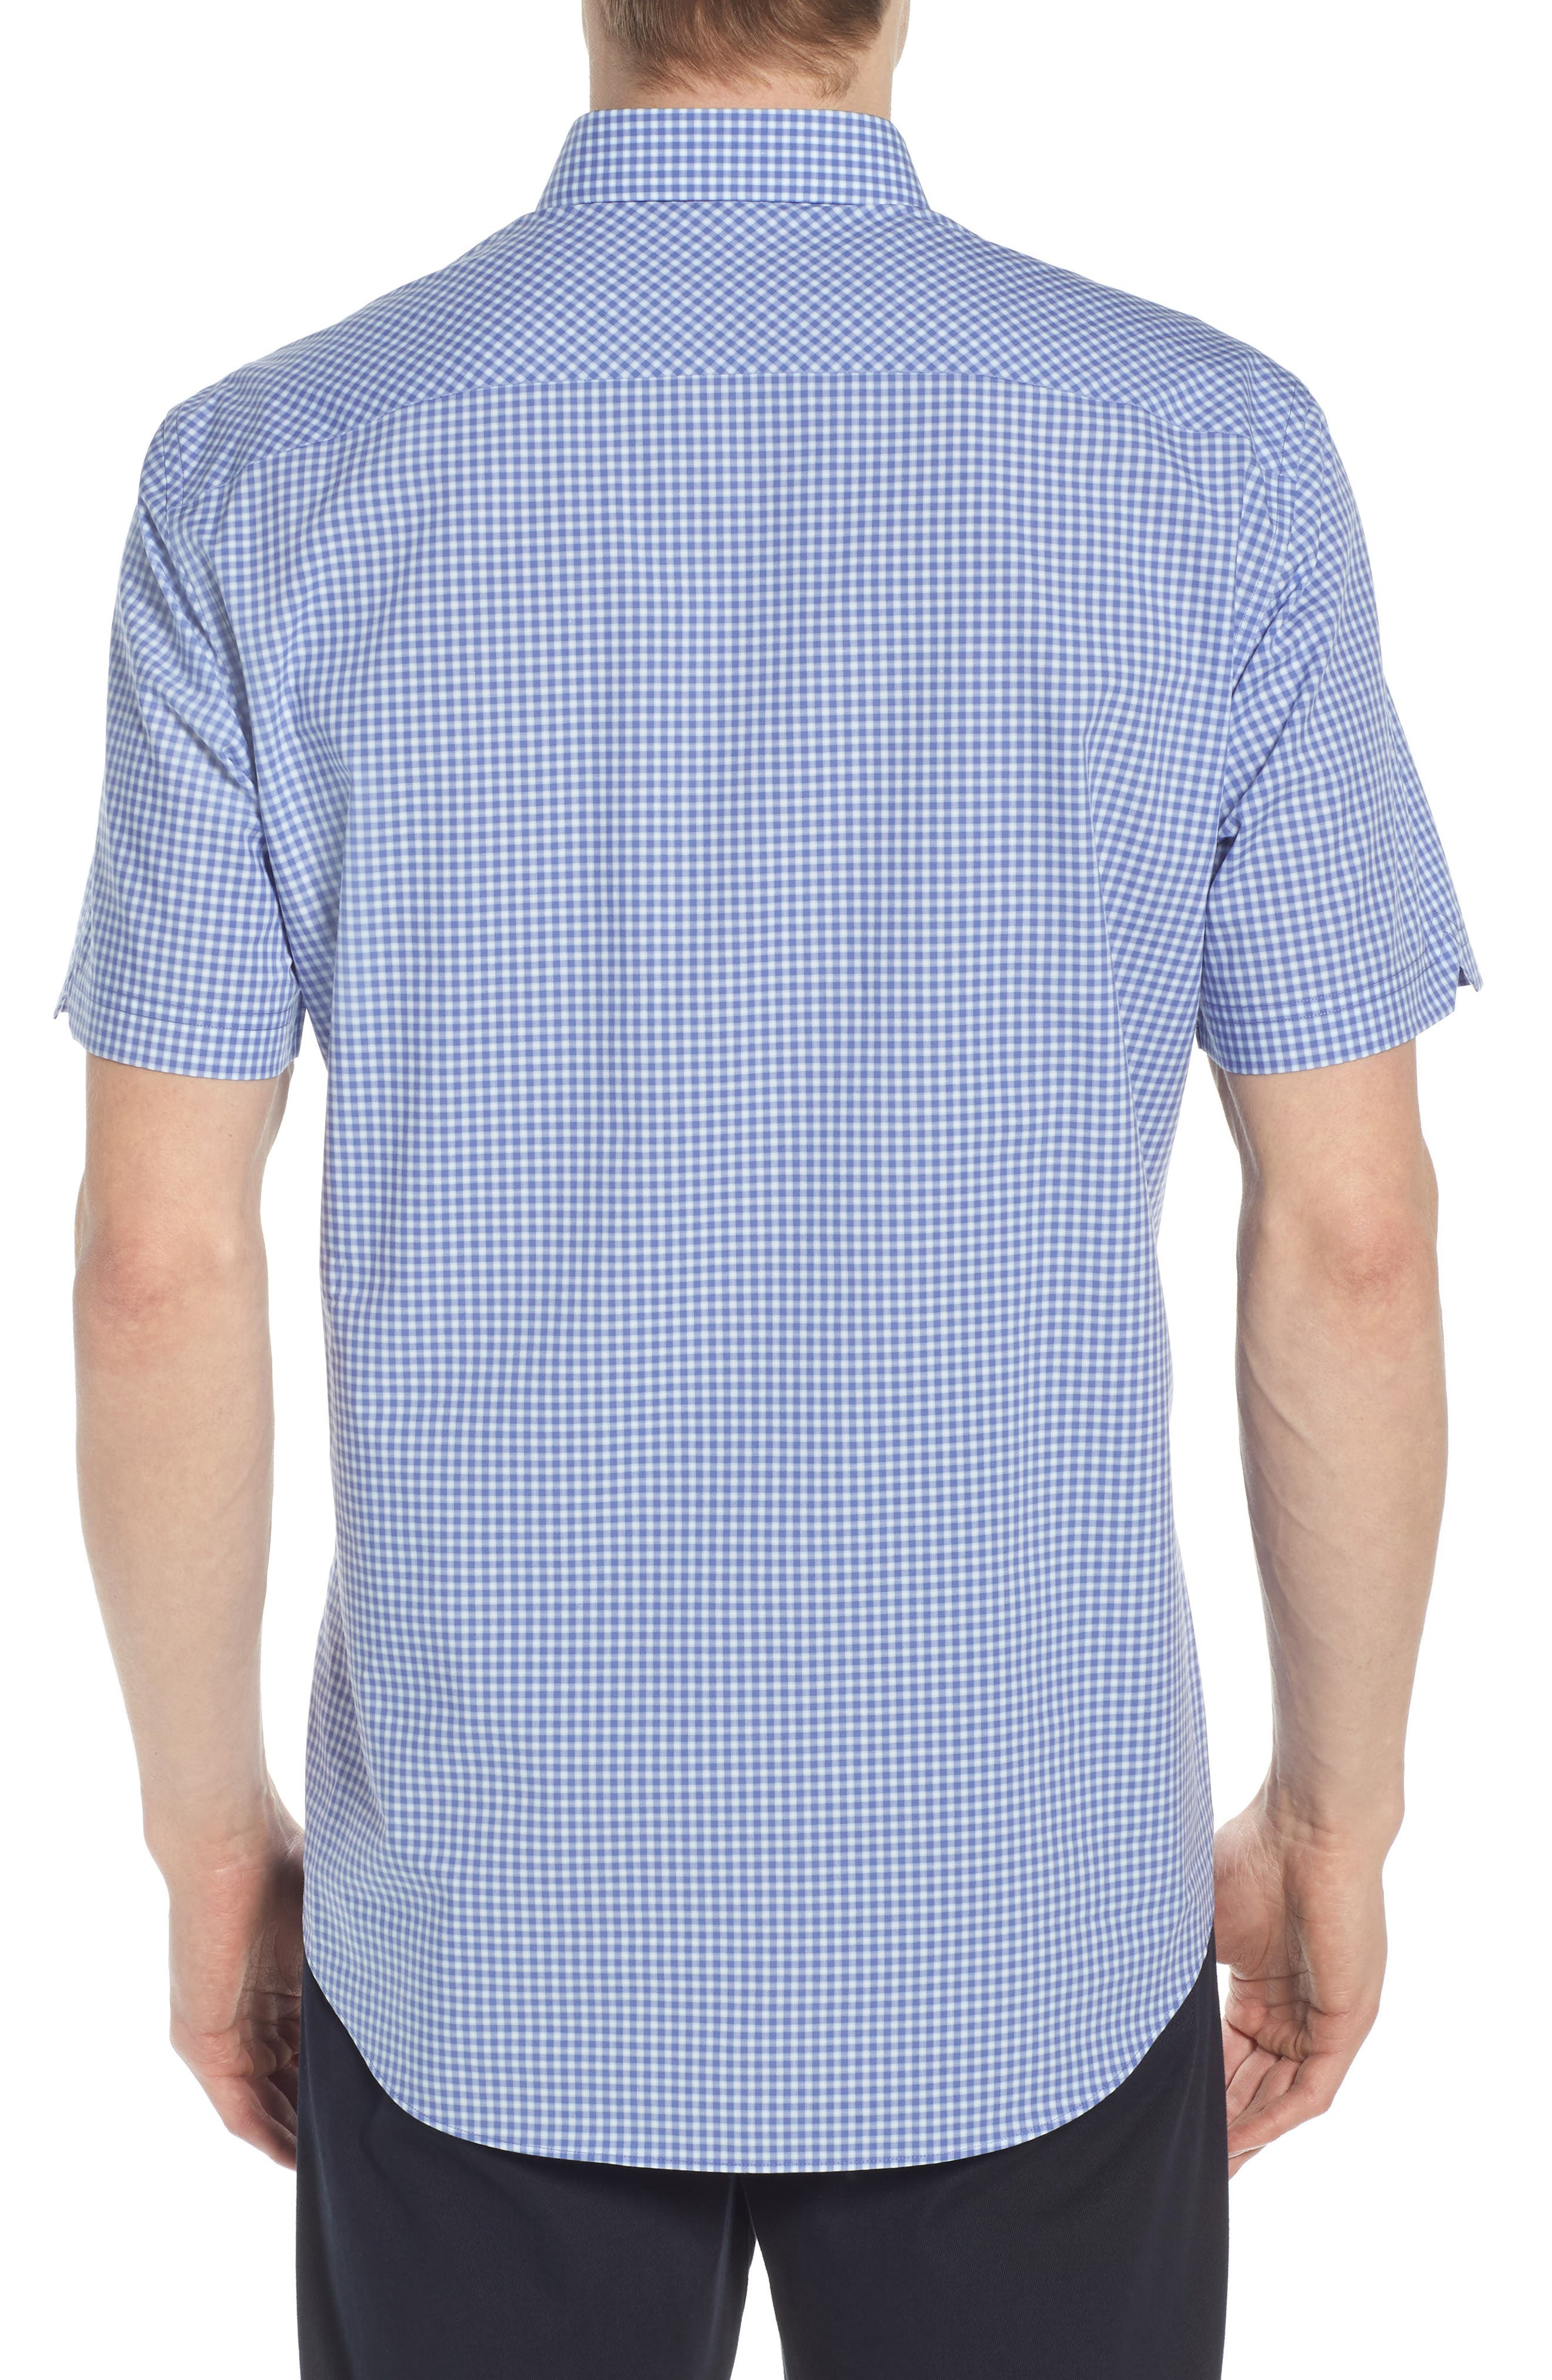 Giovinco Plaid Sport Shirt,                             Alternate thumbnail 3, color,                             Ocean